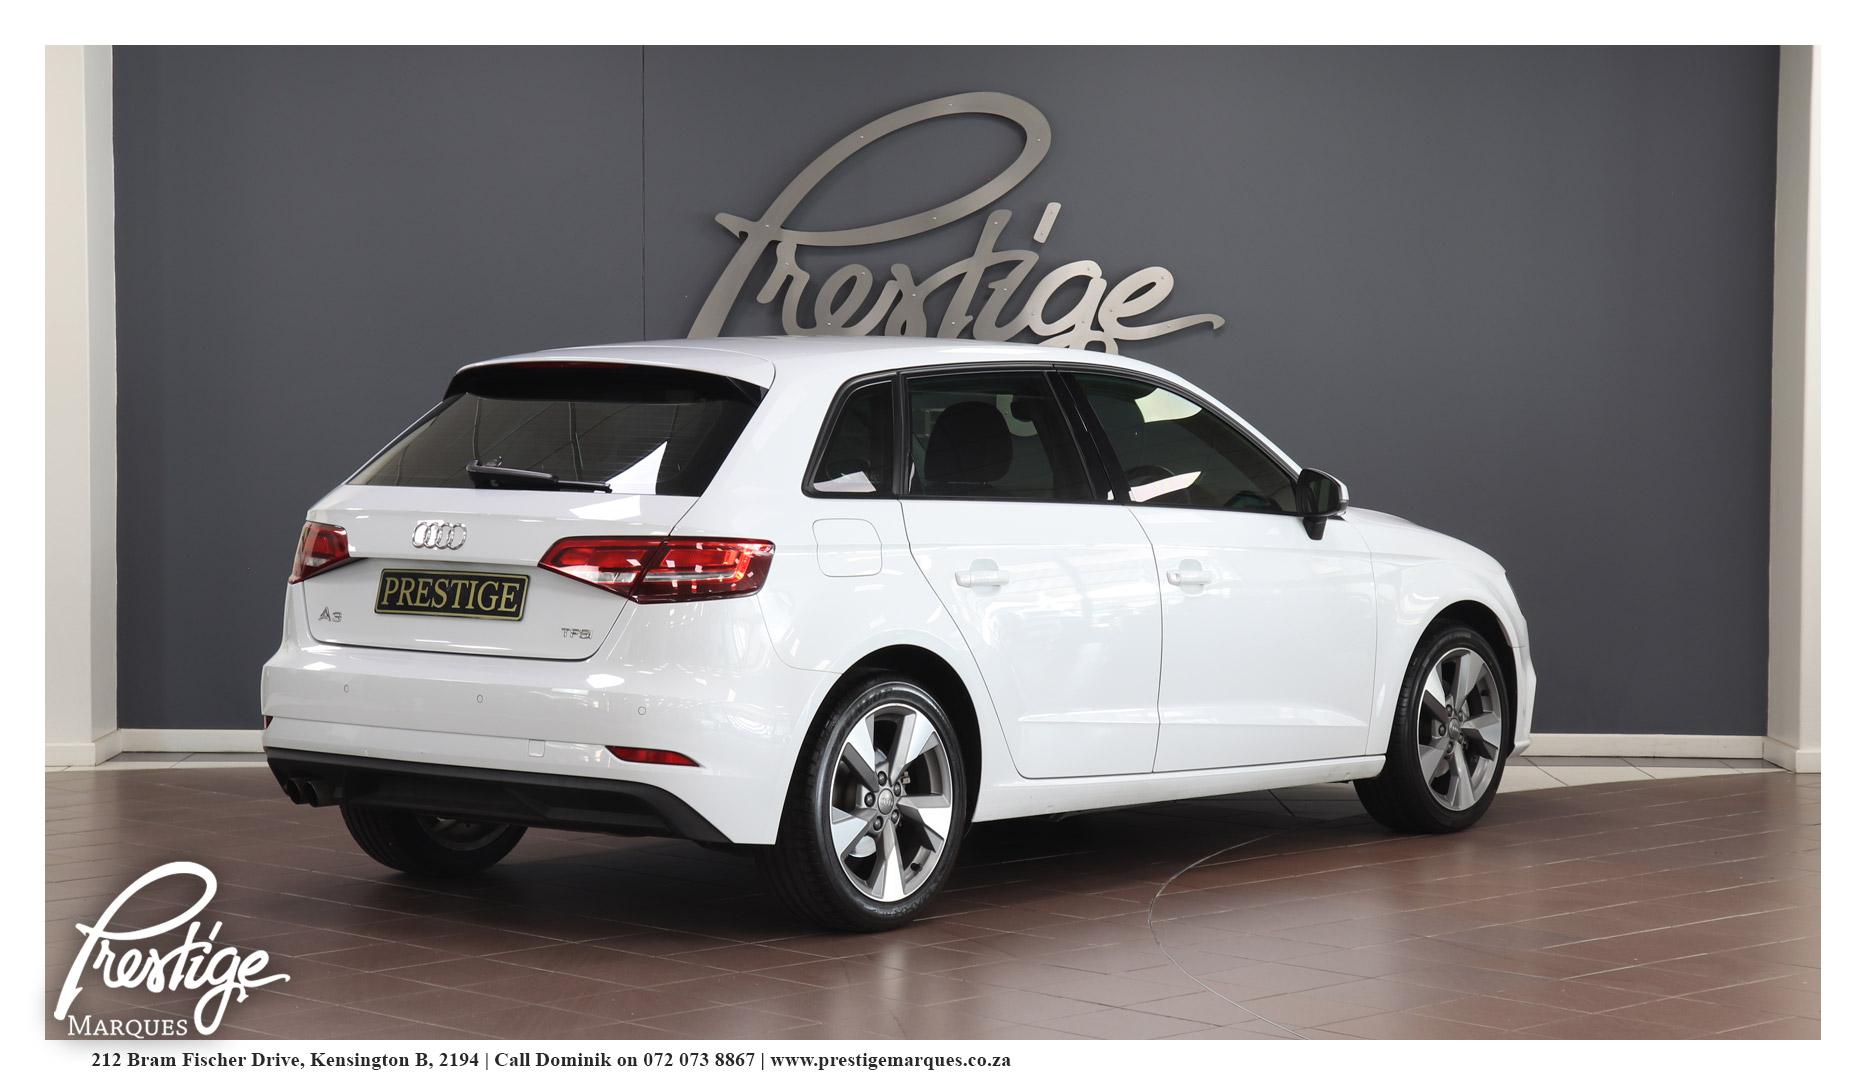 2017-Audi-A3-Sportback-1-4-TFSi-Stronic-Prestige-Marques-Randburg-Sandton-4